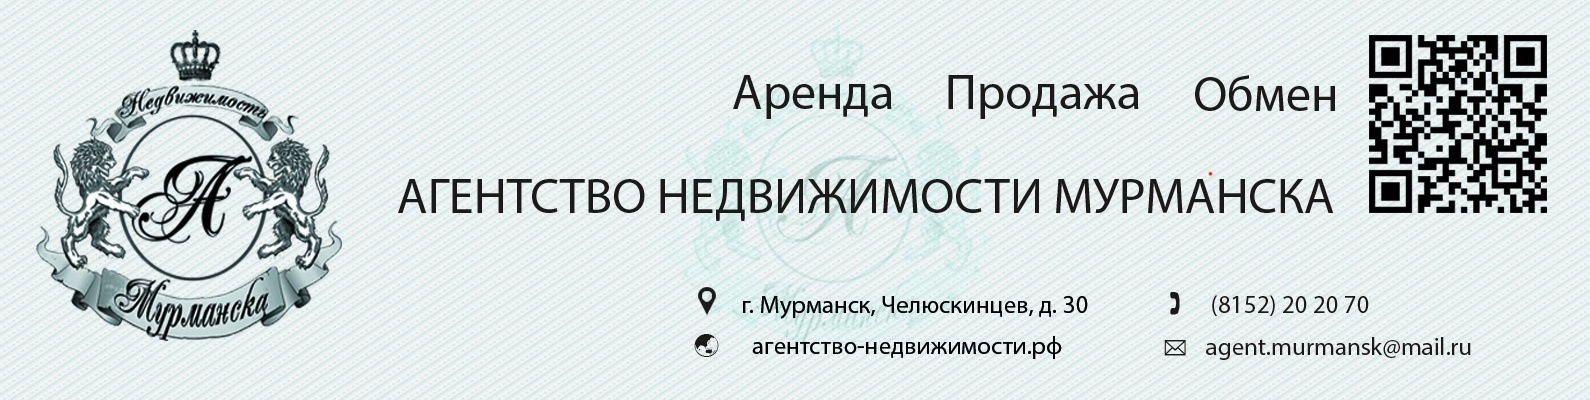 АГЕНТСТВО НЕДВИЖИМОСТИ МУРМАНСКА | ВКонтакте